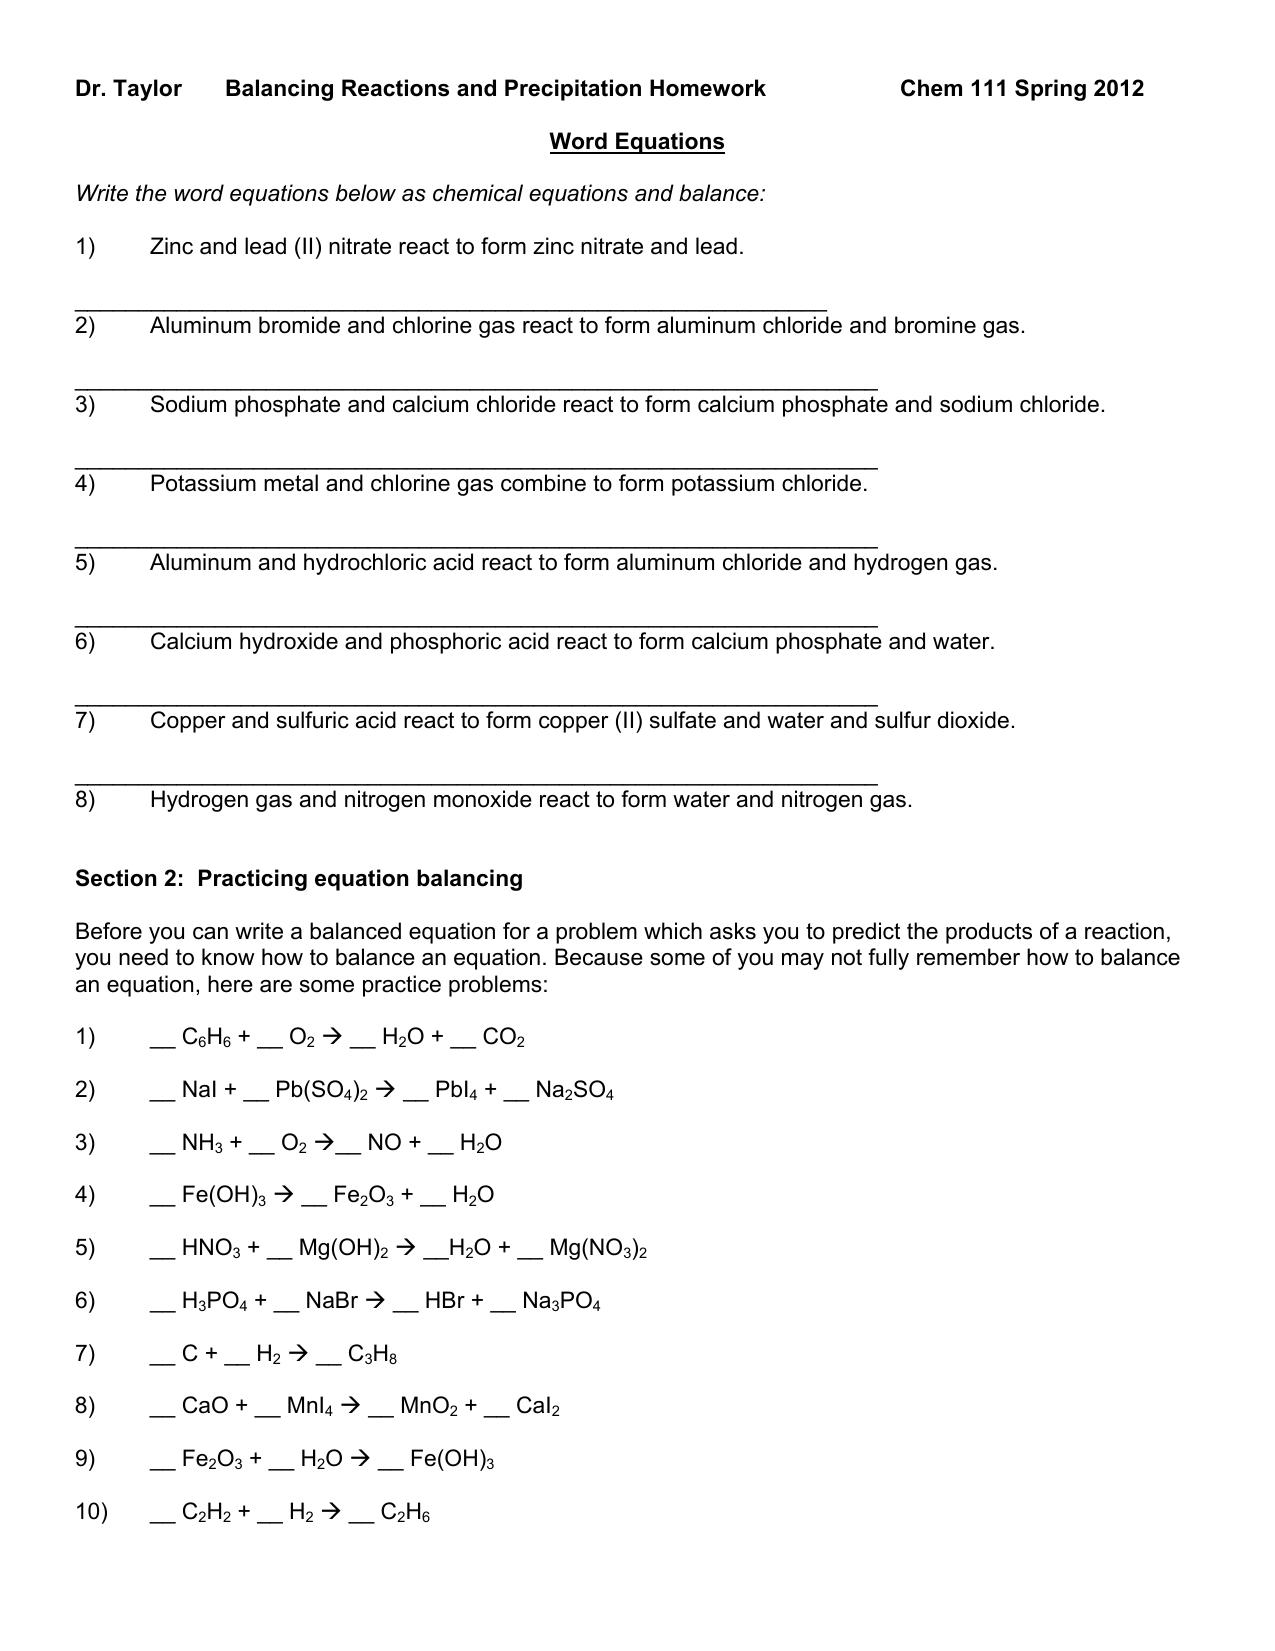 Balancing Chemical Equations | Free Homework Help